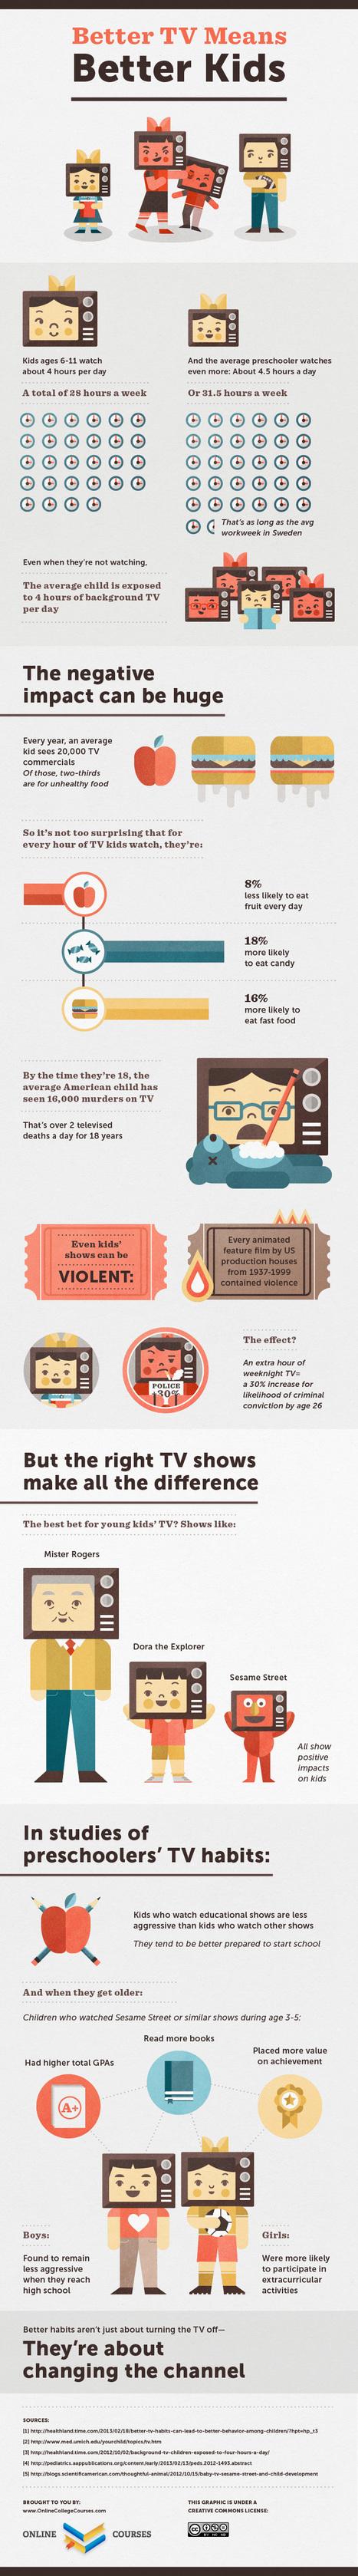 Good TV Habits Can Make Kids Smarter | Social Mercor | Scoop.it